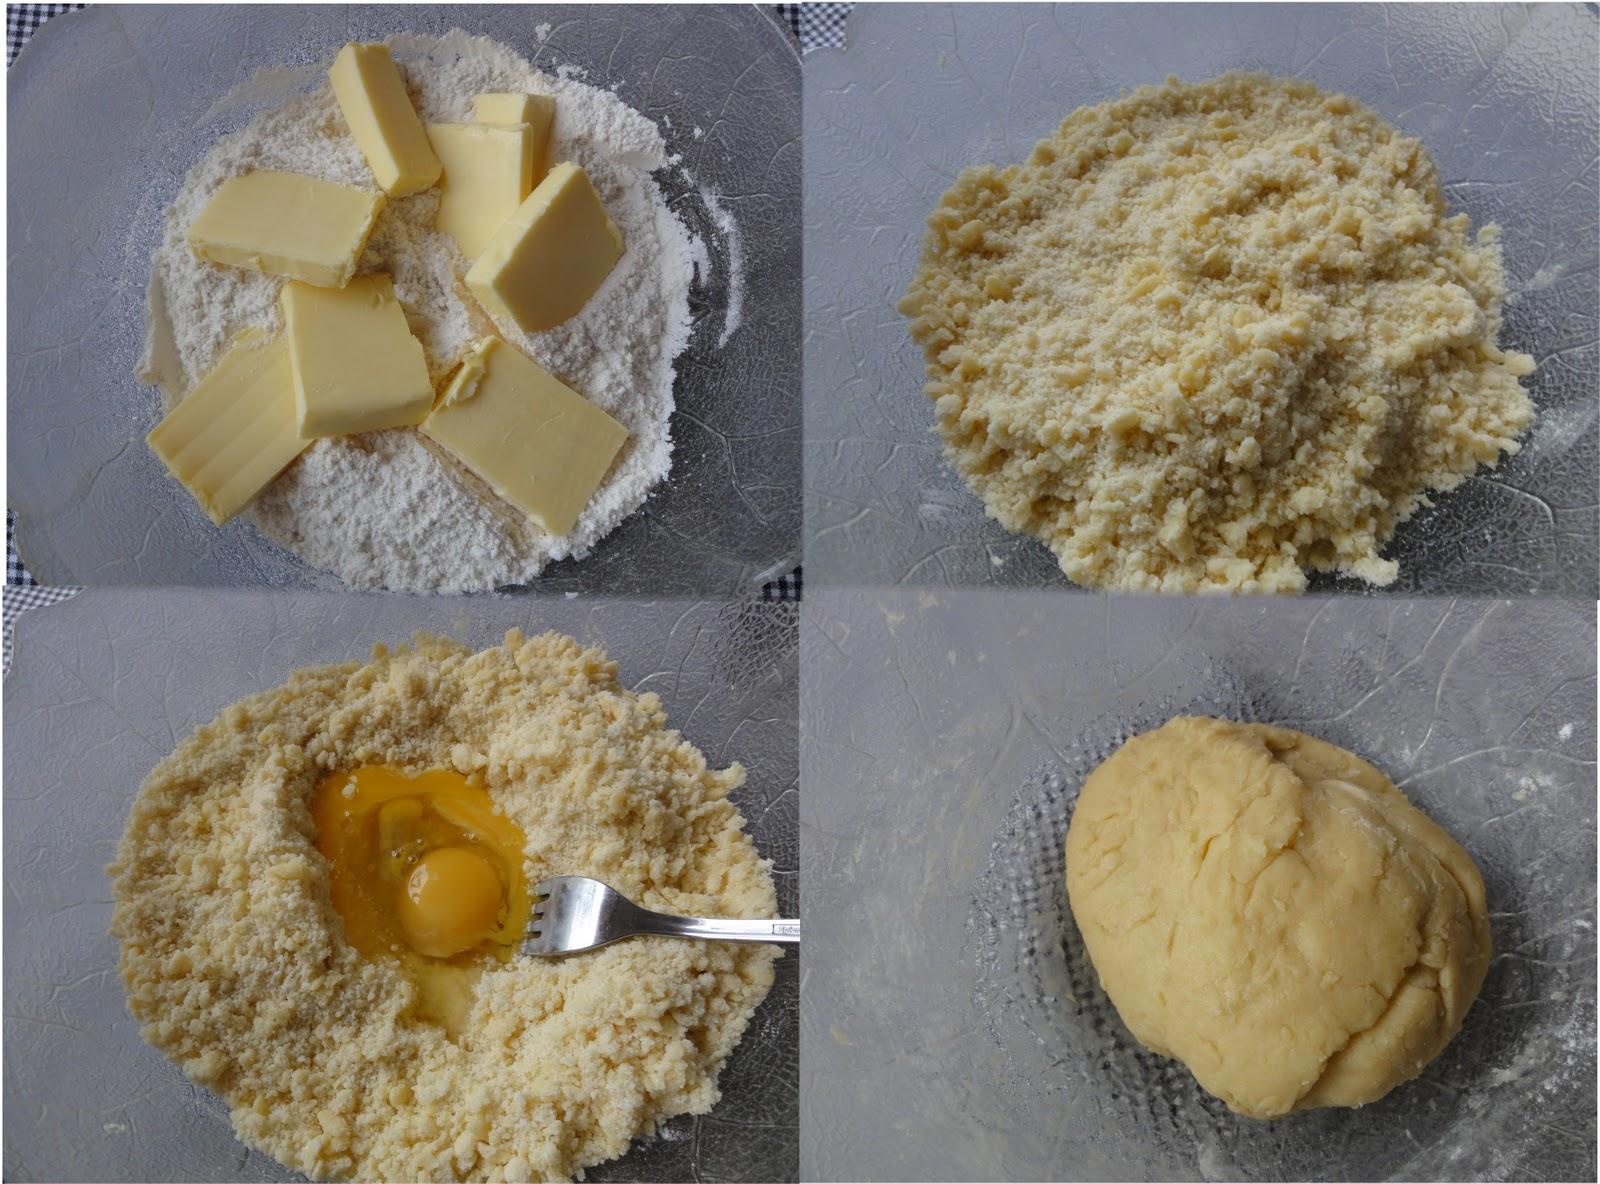 Rathai's Recipes: Crostata di Marmellata - Raspberry Crostata